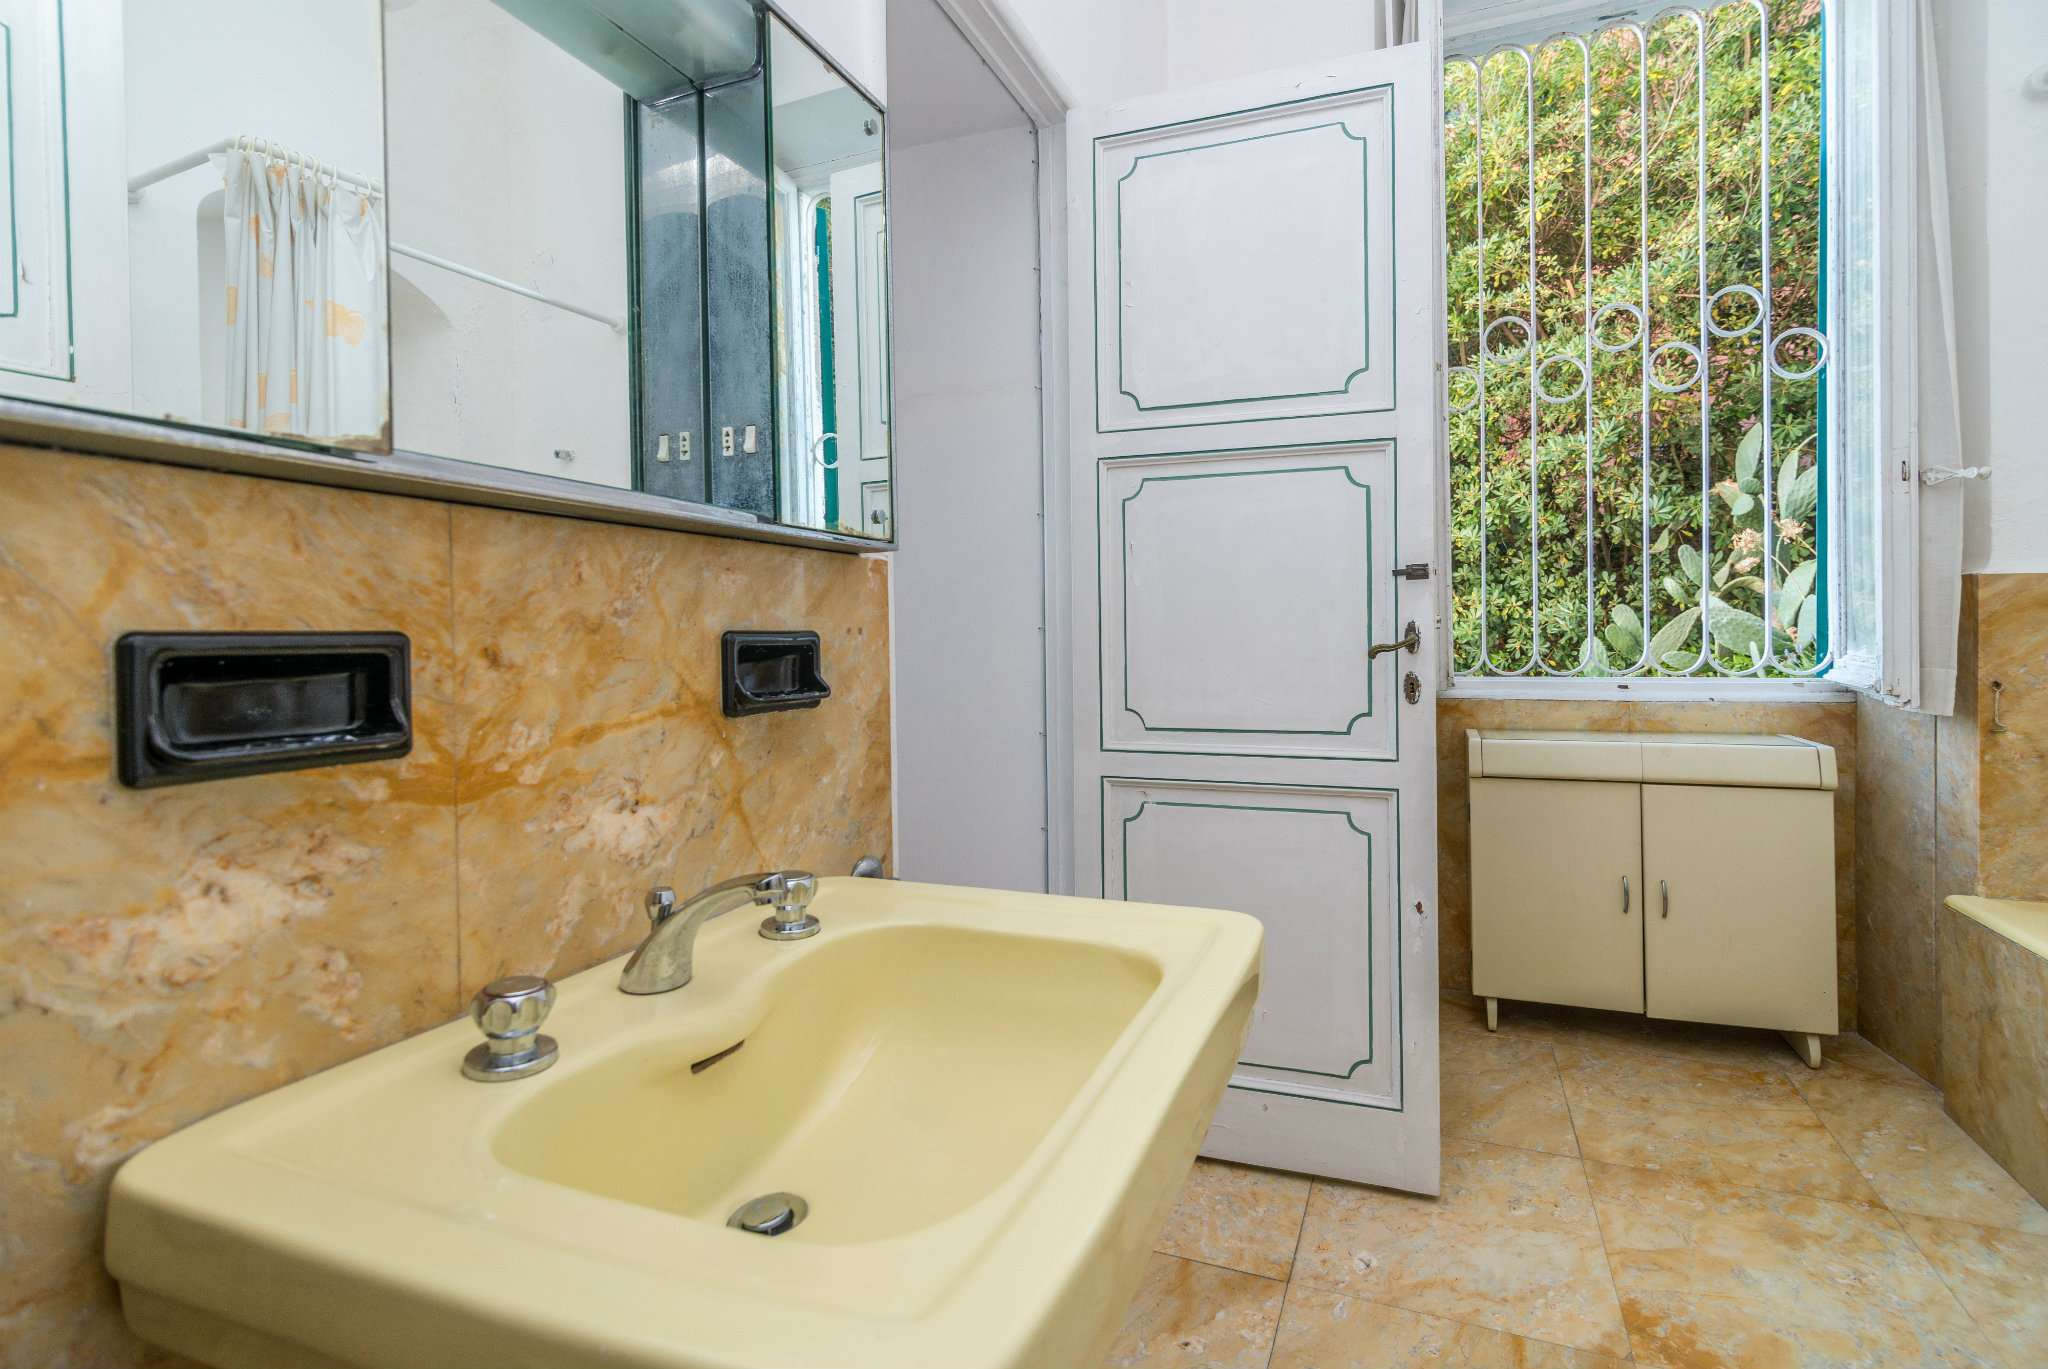 Villa in Vendita a Santa Margherita Ligure: 5 locali, 545 mq - Foto 9